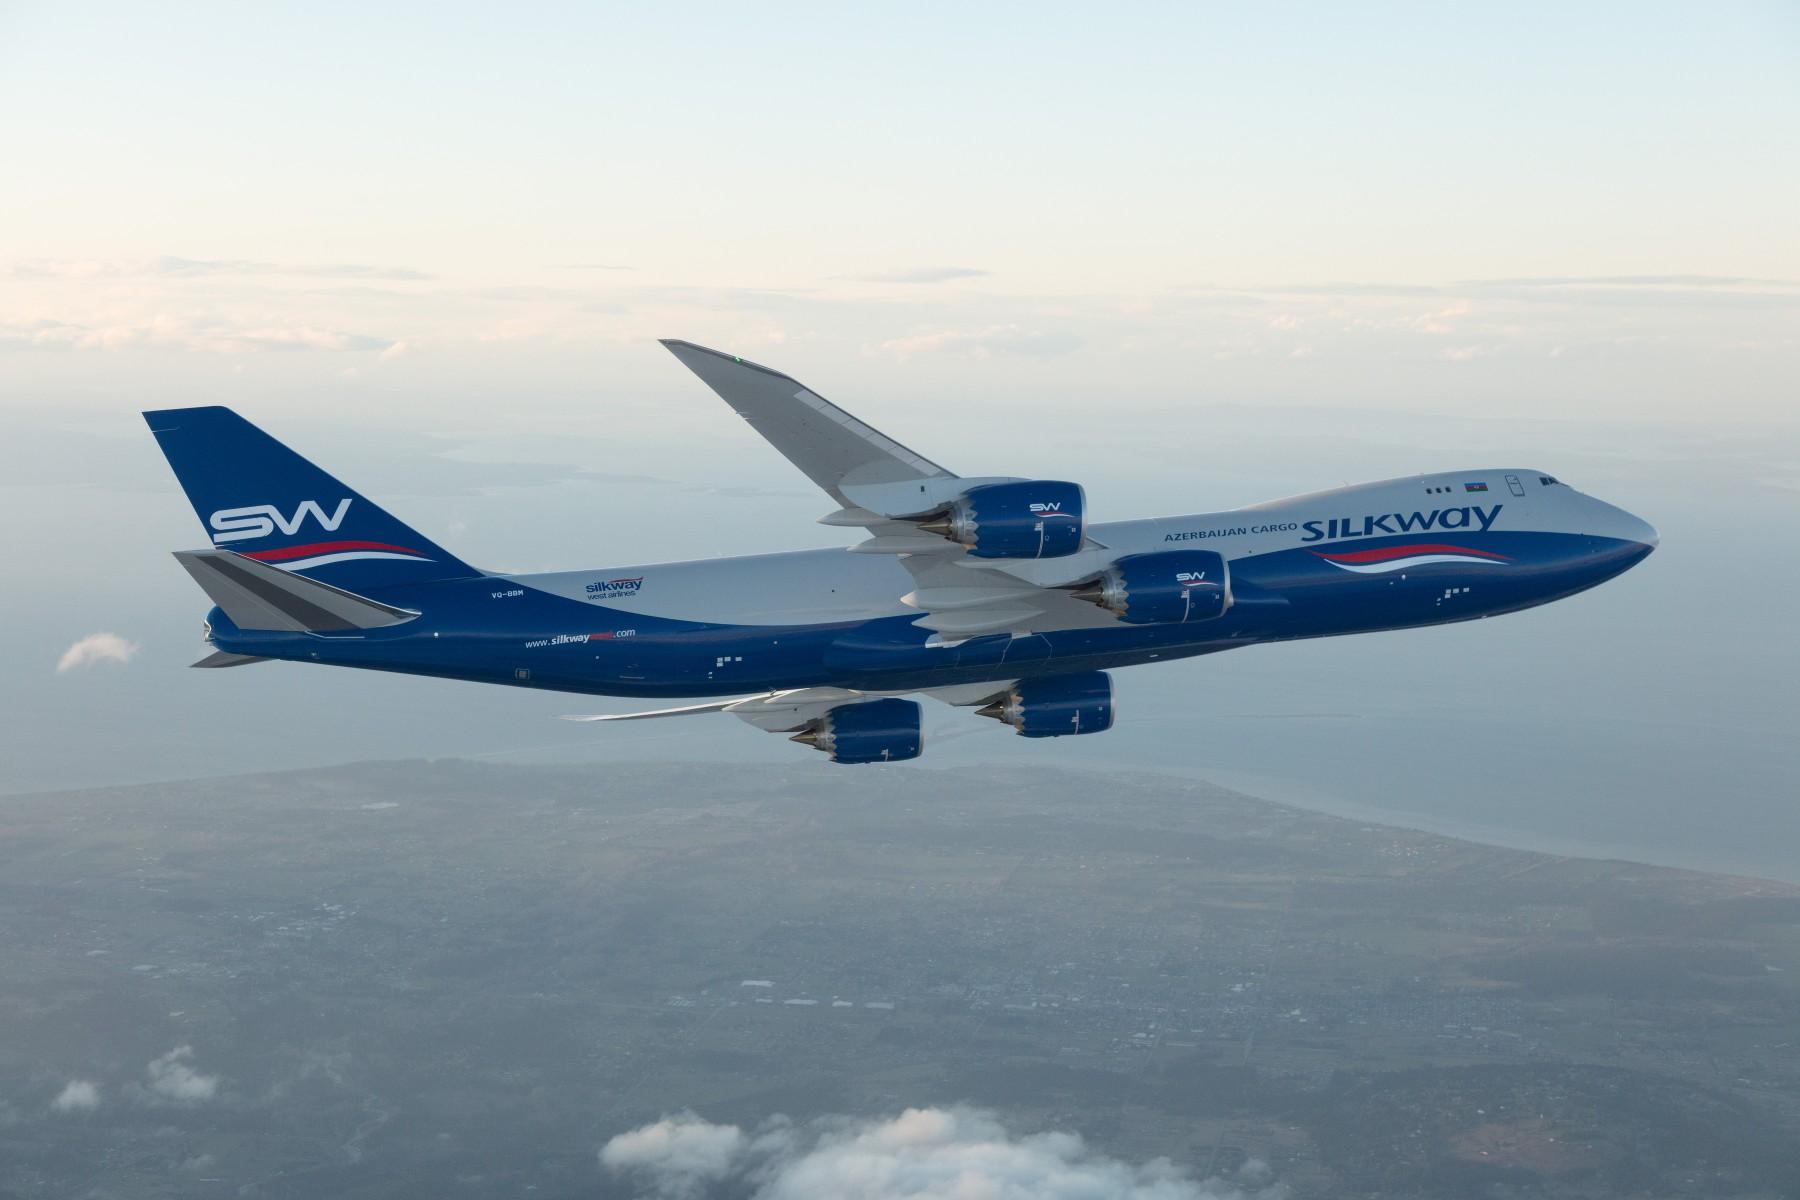 The Seventh International Caspian Air Cargo Summit 2017